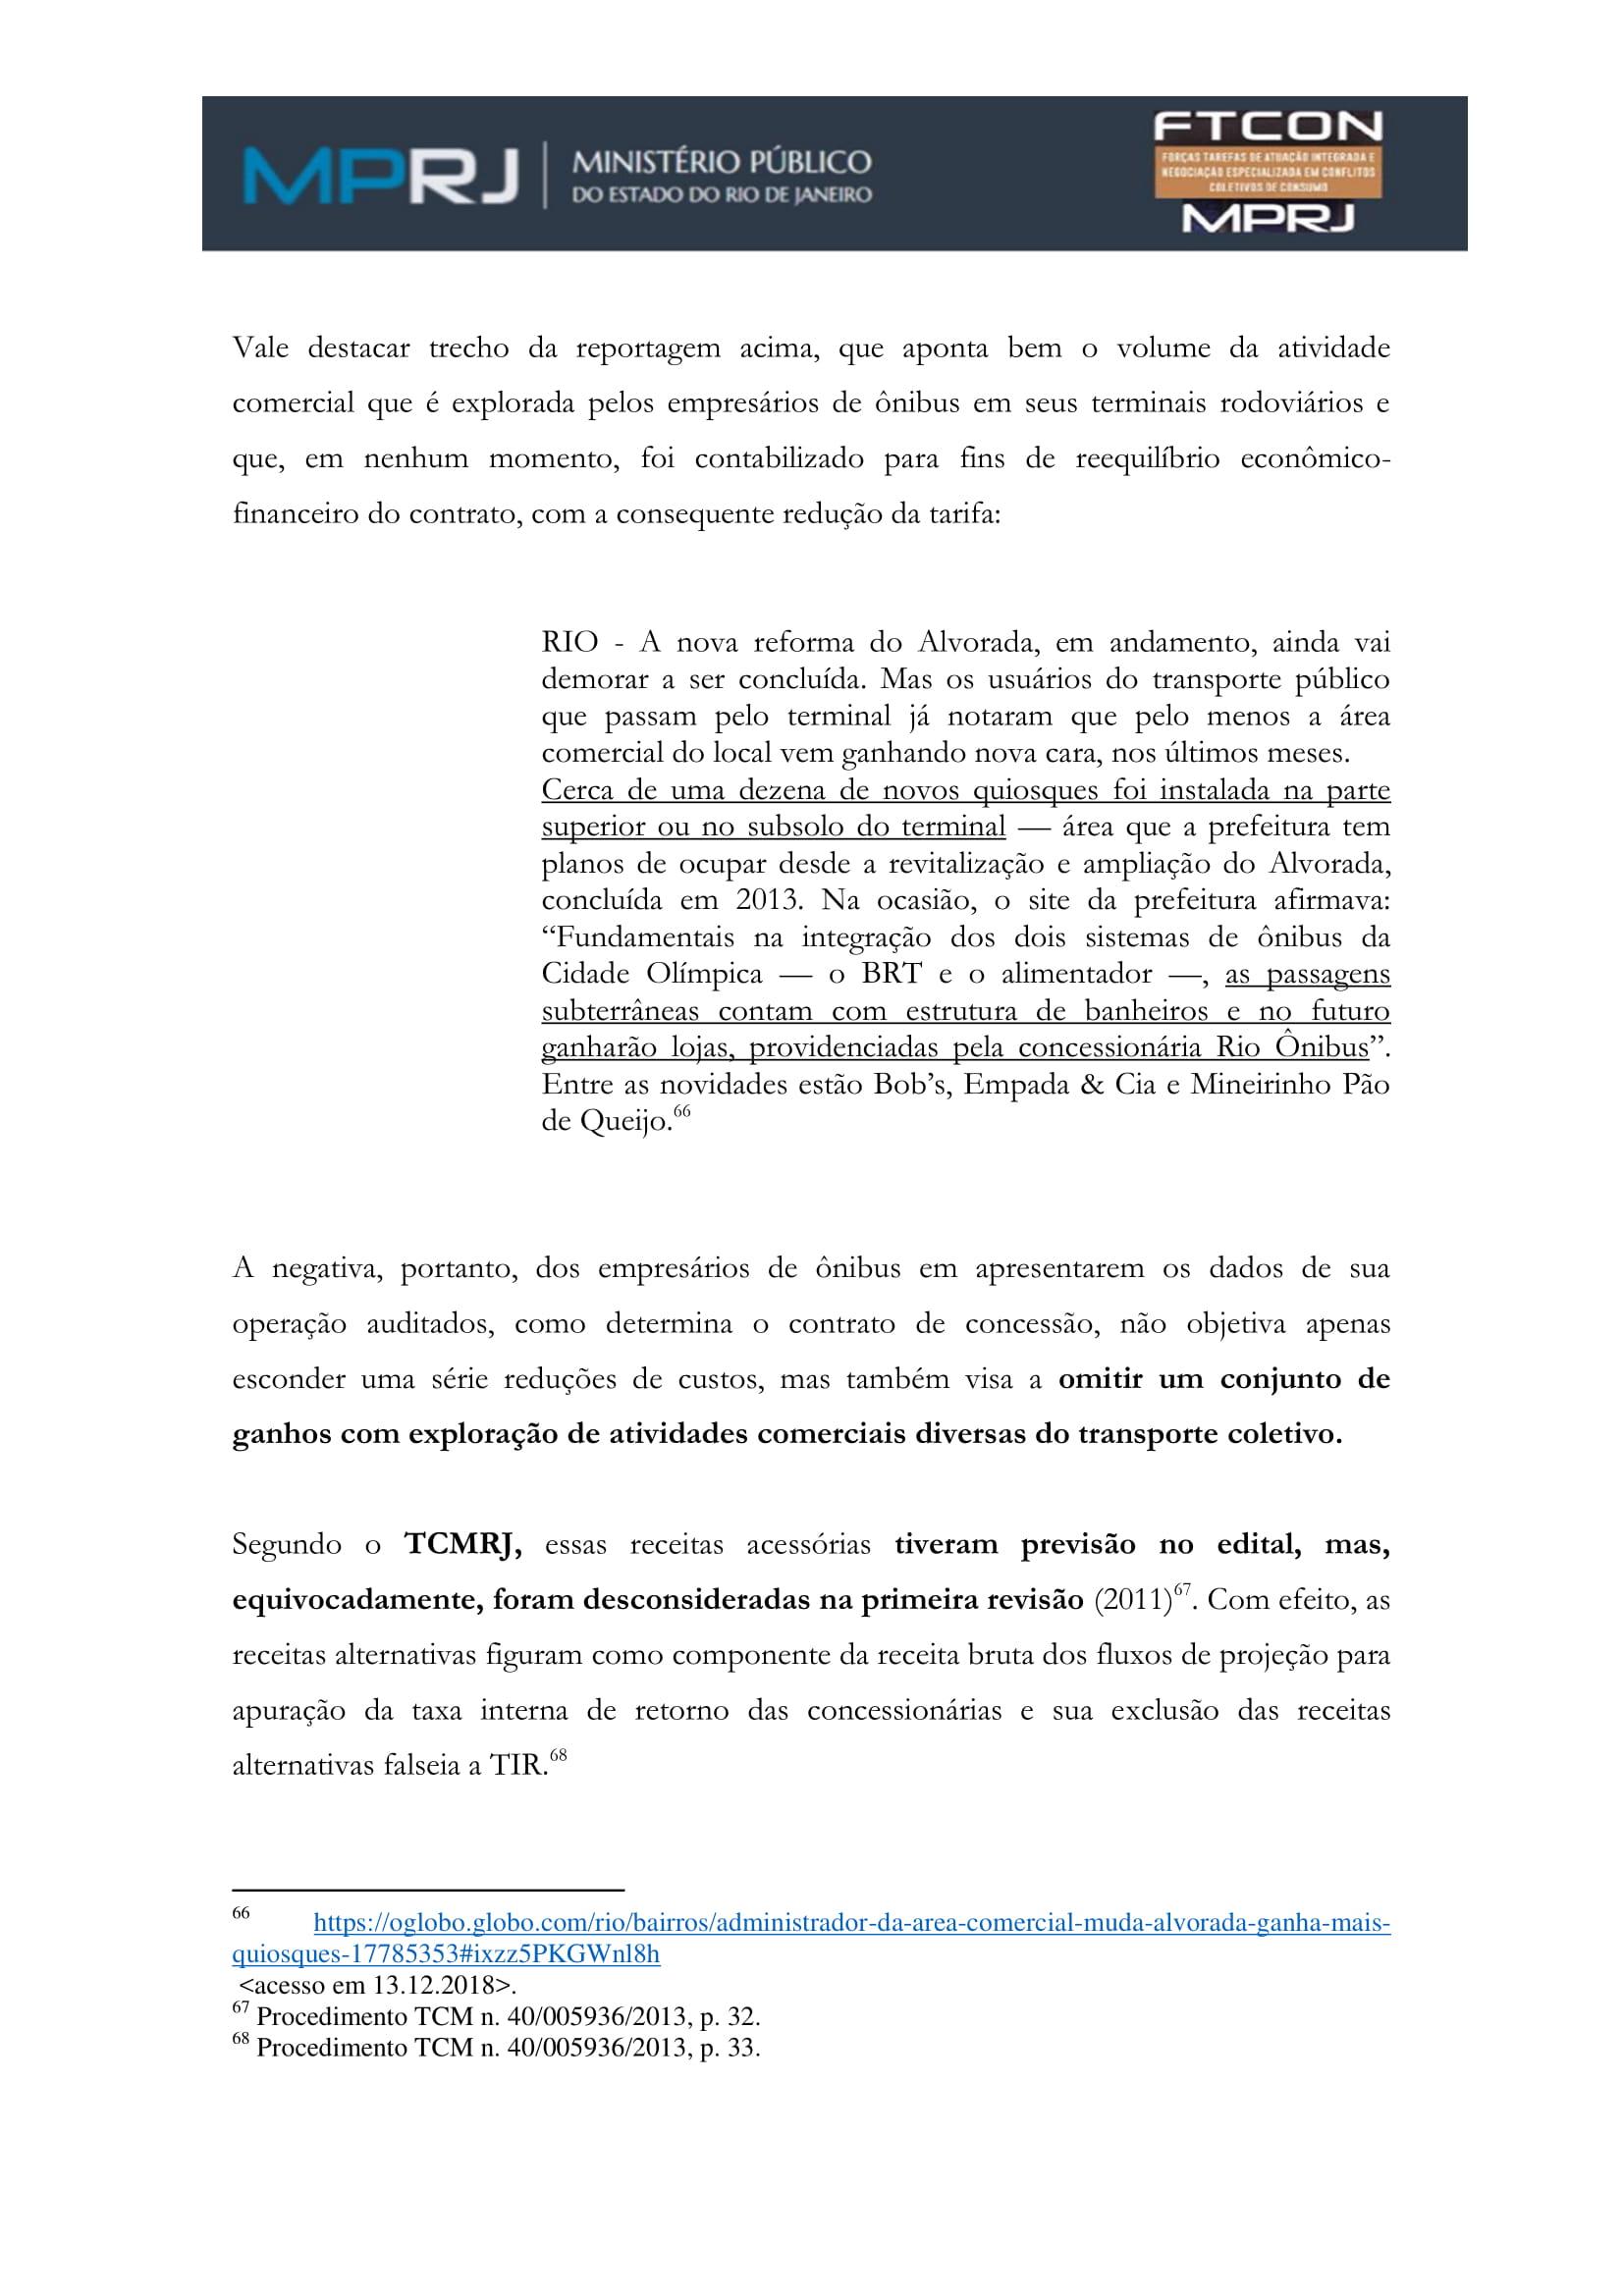 acp_caducidade_onibus_dr_rt-079